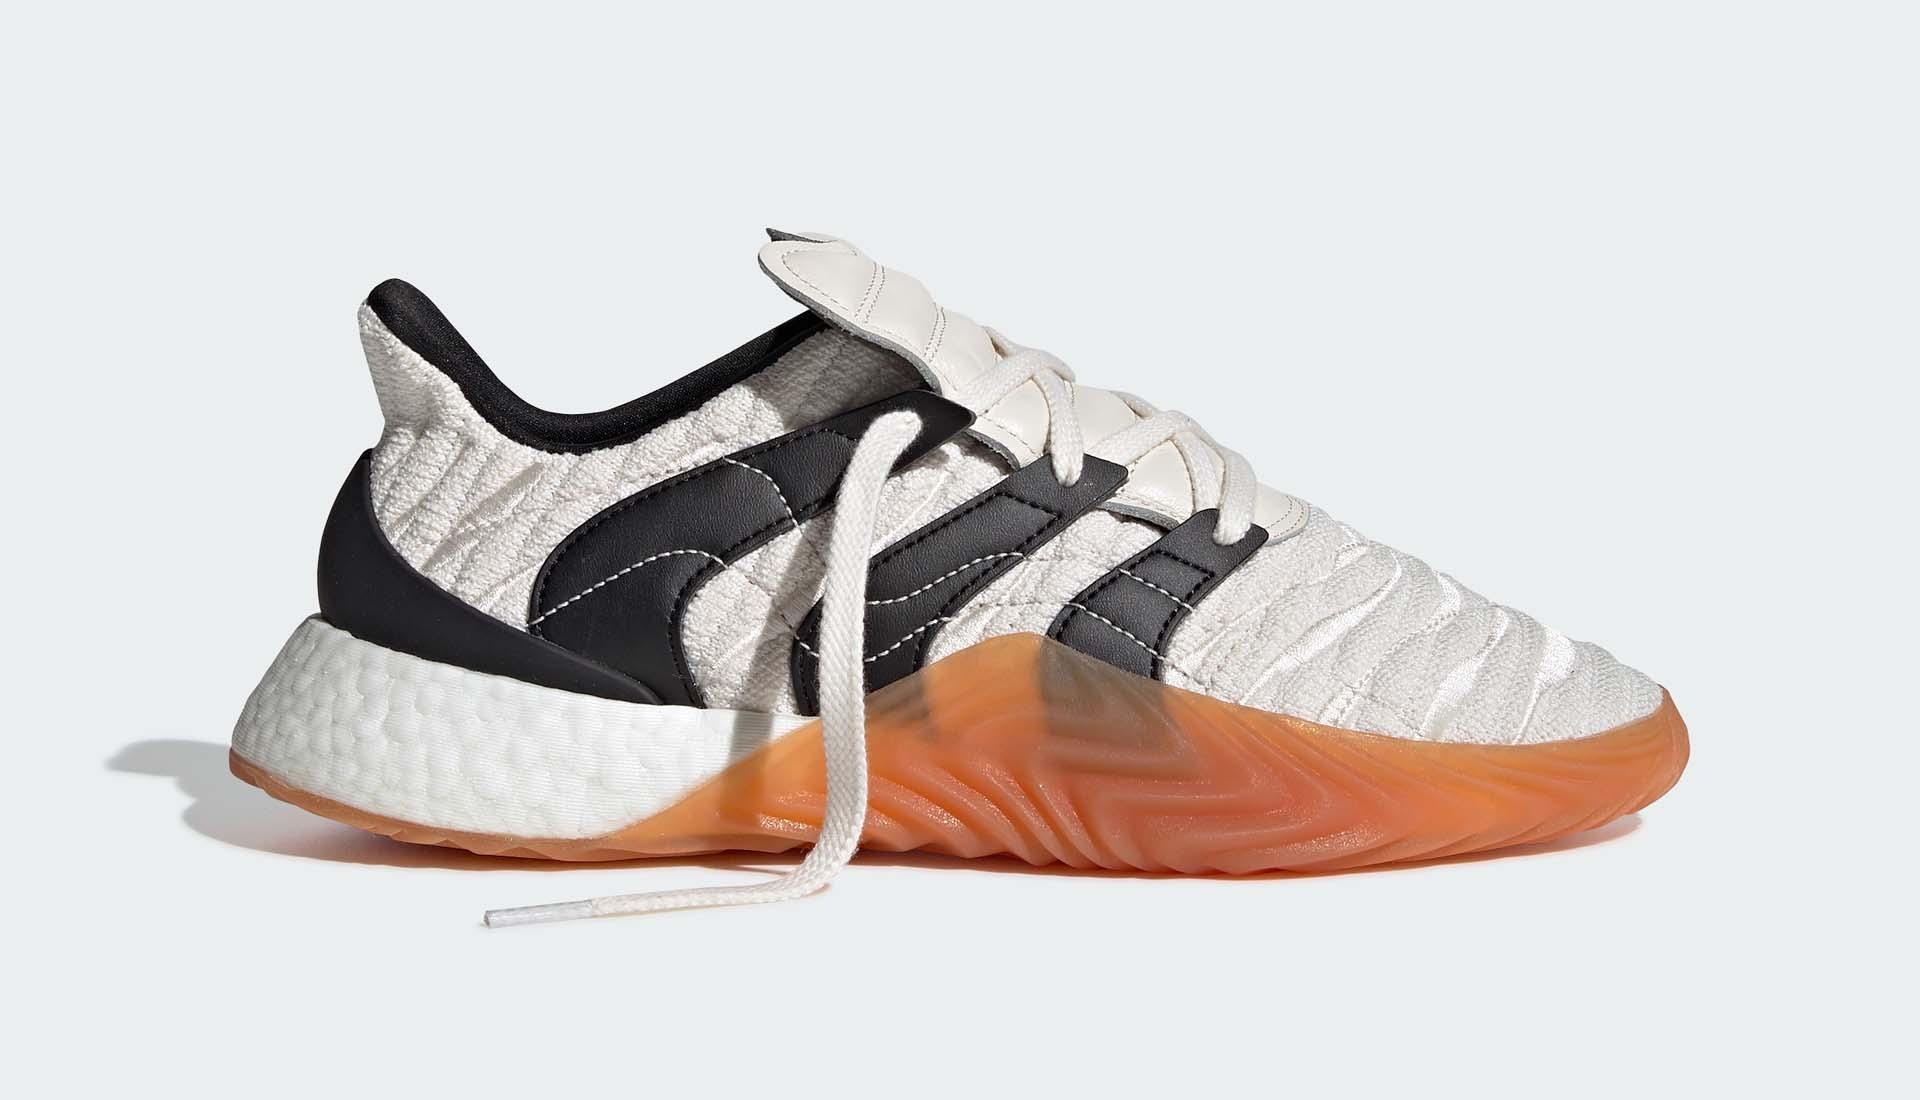 desconectado Brújula Oclusión  adidas Originals Launch The Sobakov Boost - SoccerBible